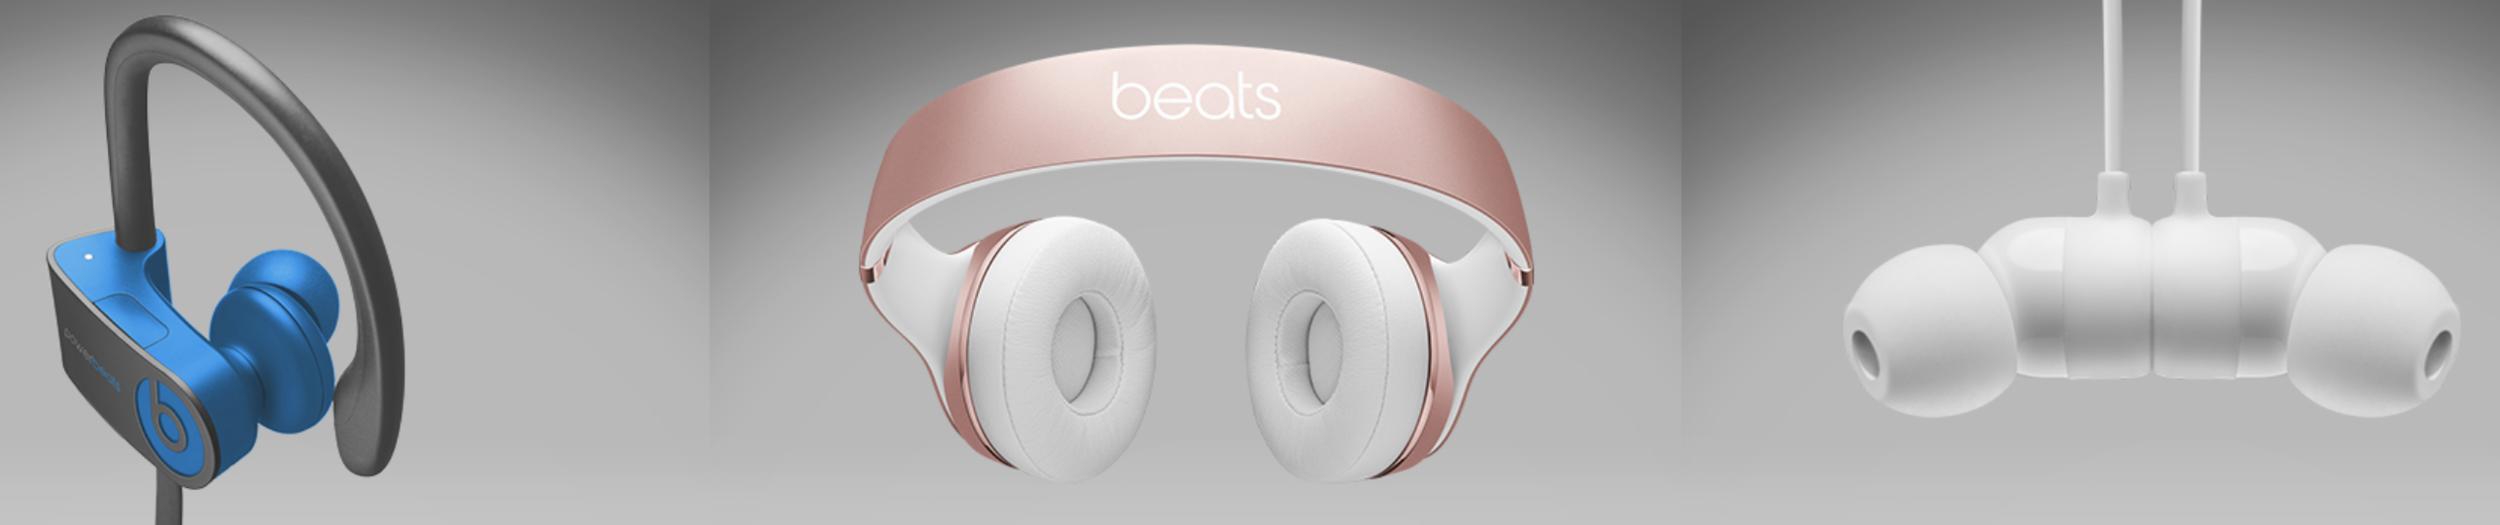 Powerbeats 3 (left), Beats Solo 3 Wireless (center), BeatsX (right)